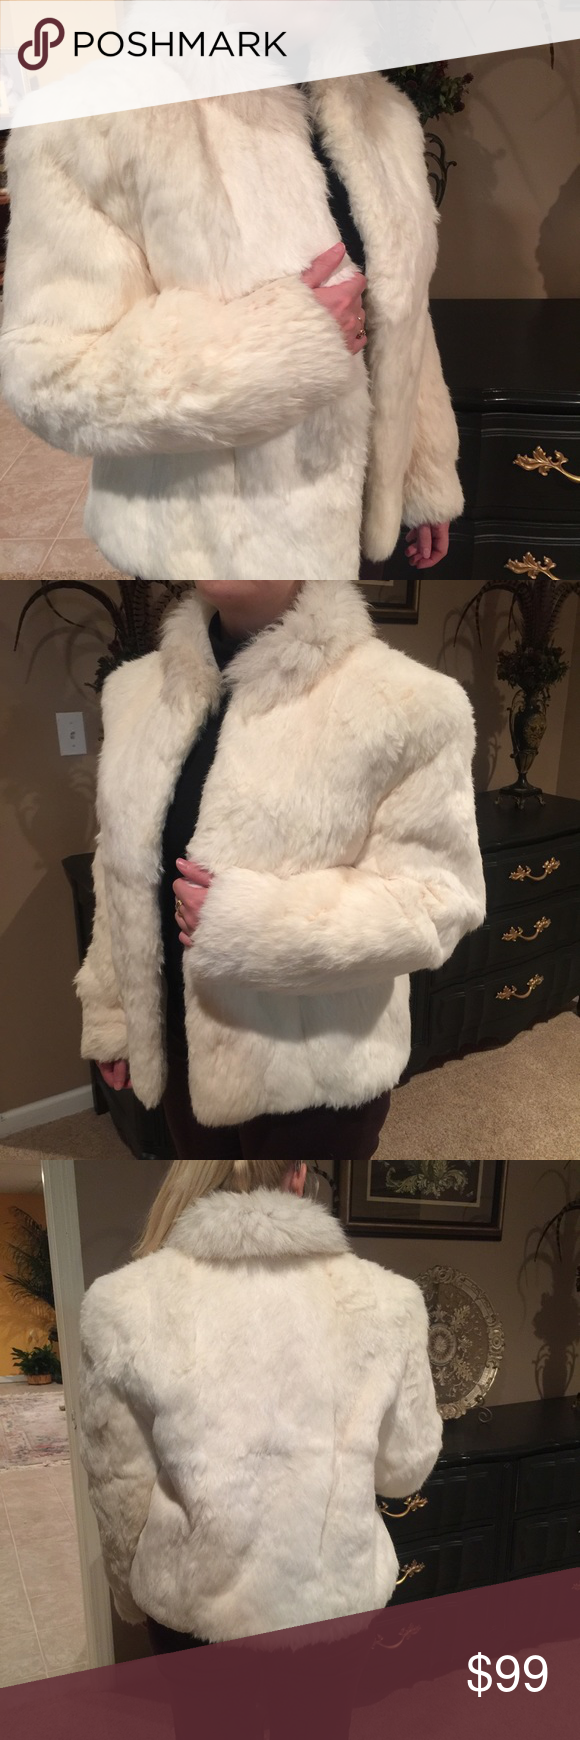 BB Dakota real rabbit fur cream jacket M org. $249 BBDakota beautiful white/cream rabbit fur with Fox collar . Half hip length . No damage, stored professionally, conditioned and ready for winter. Original price$249.00 size M BB Dakota Jackets & Coats